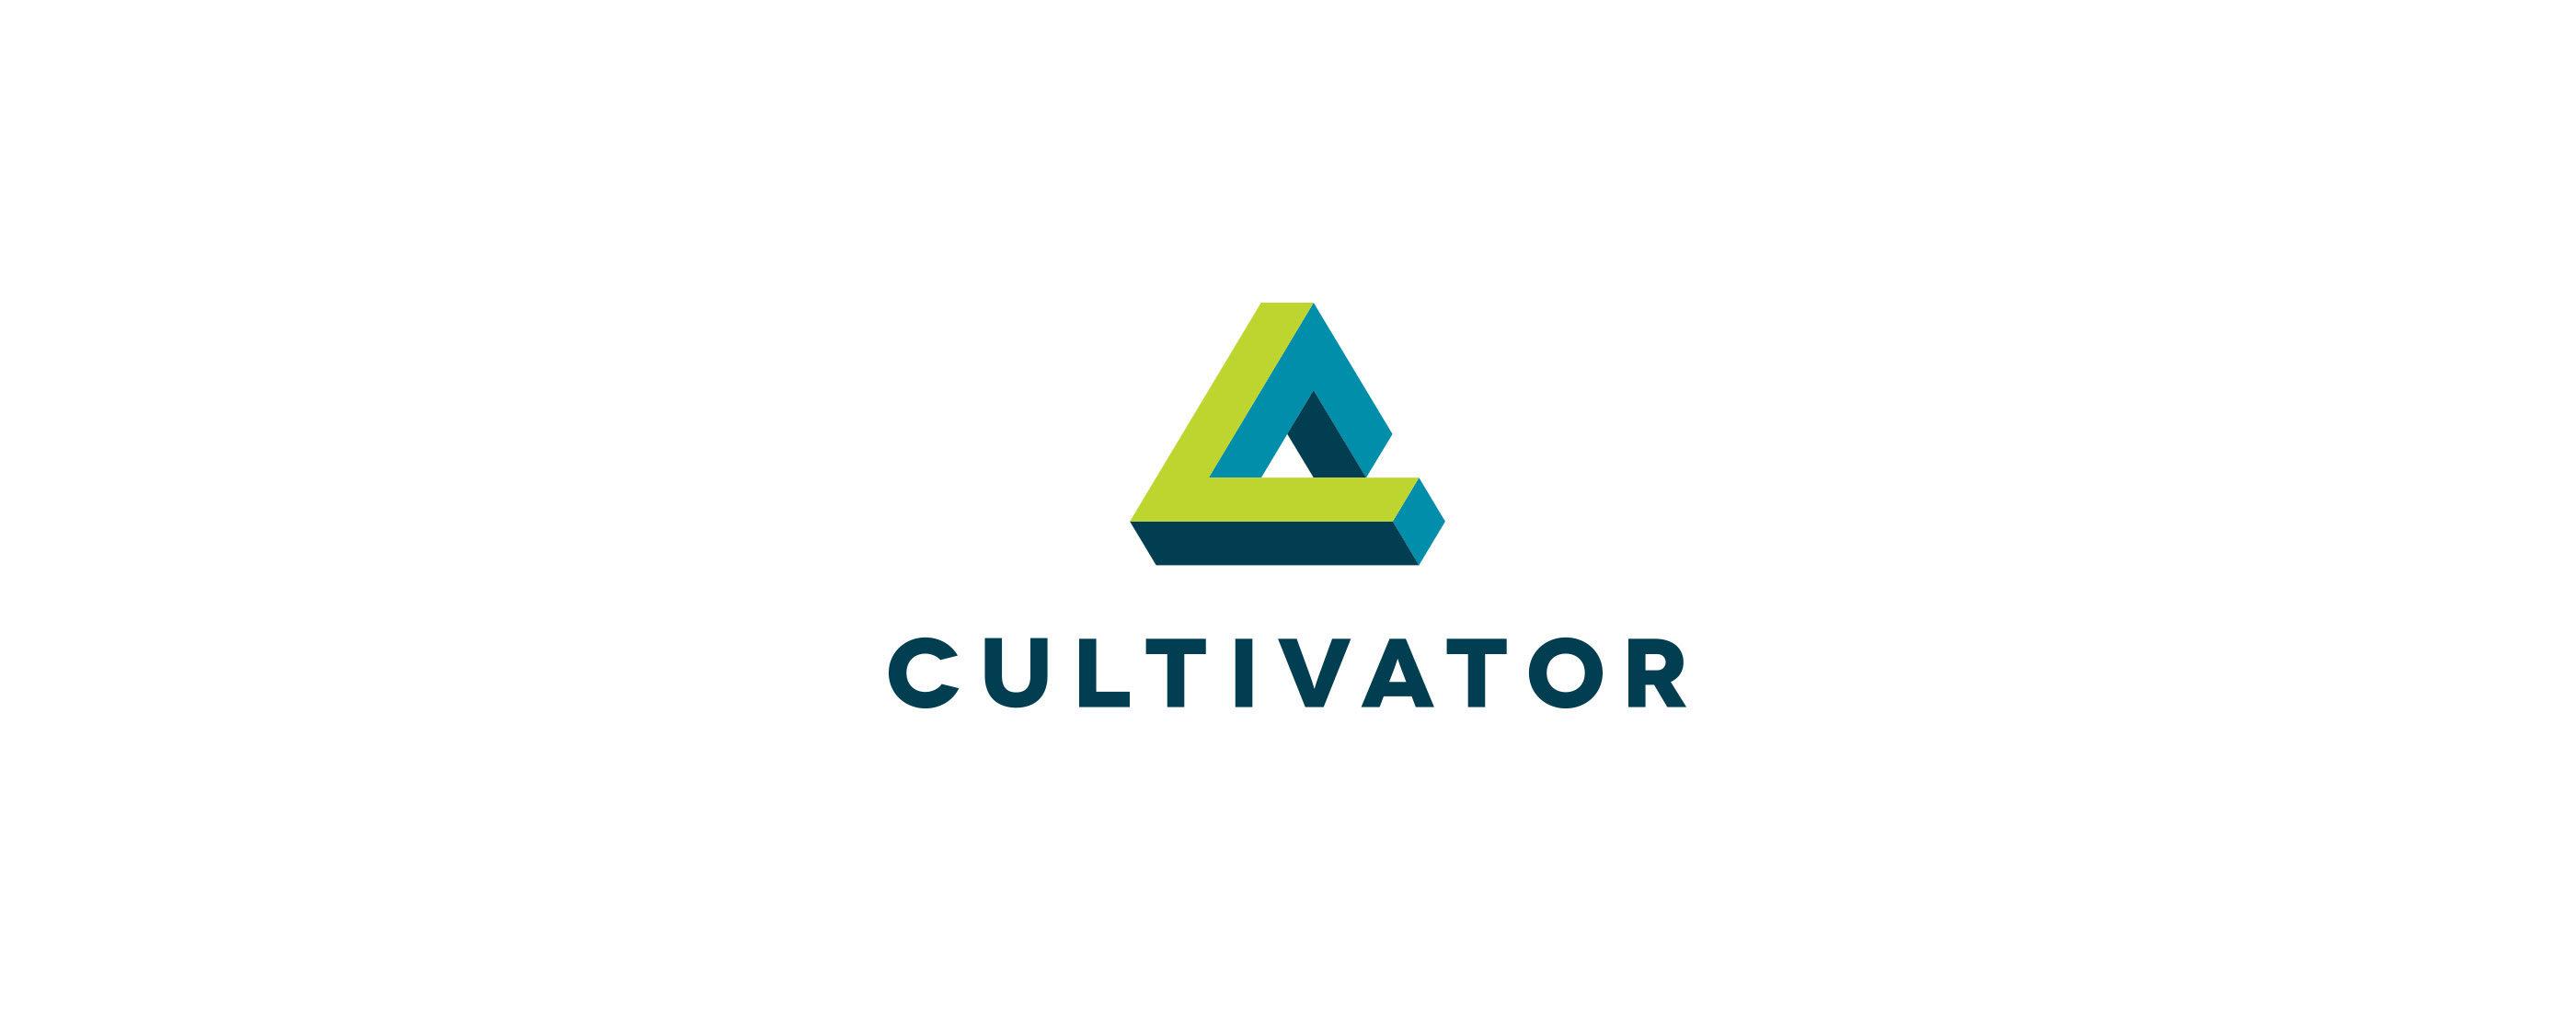 Cultivator Logo